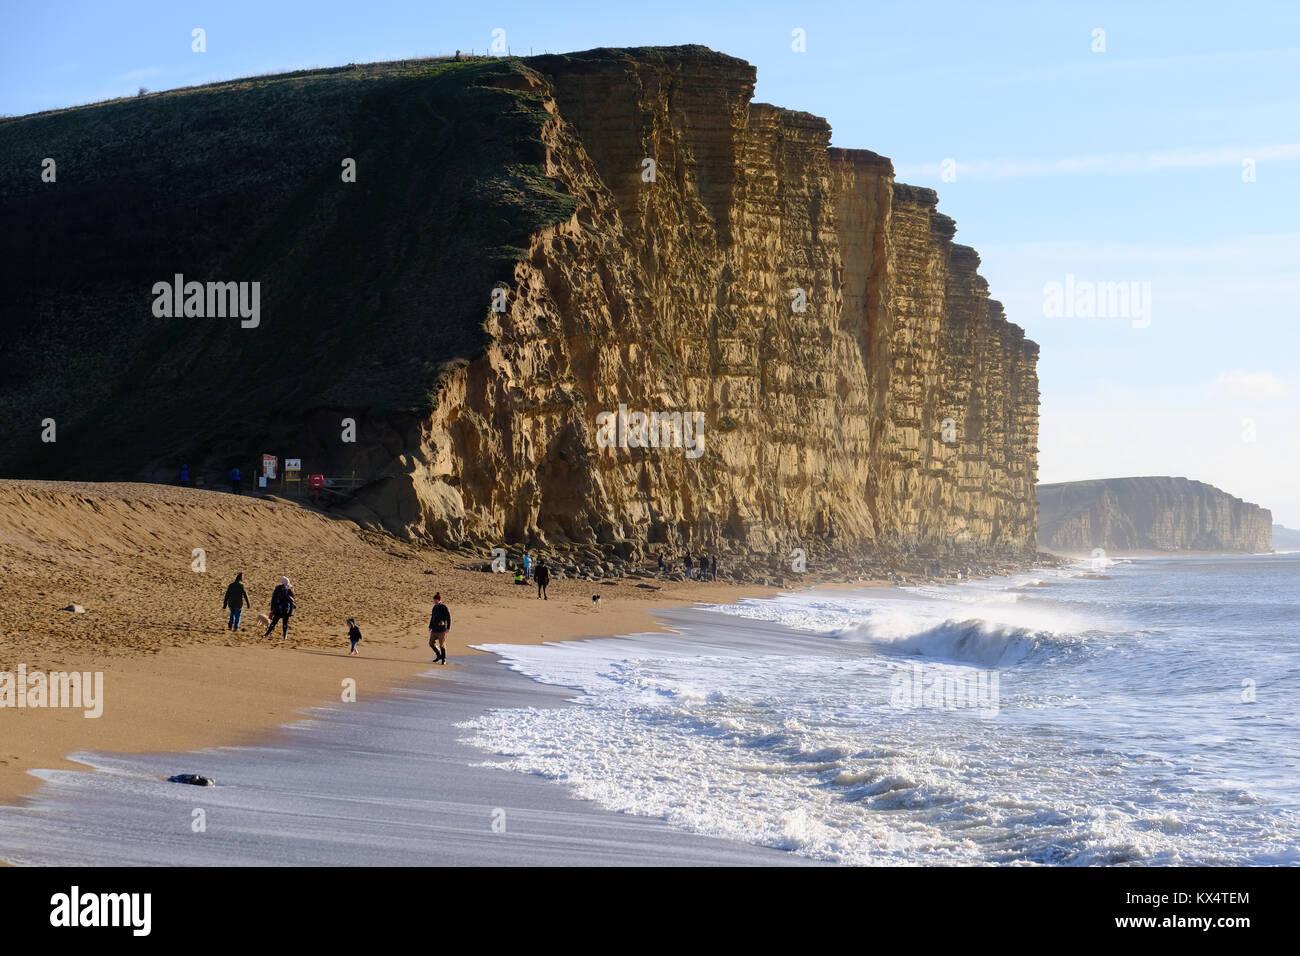 west-bay-dorset-uk-7-january-2018-beach-